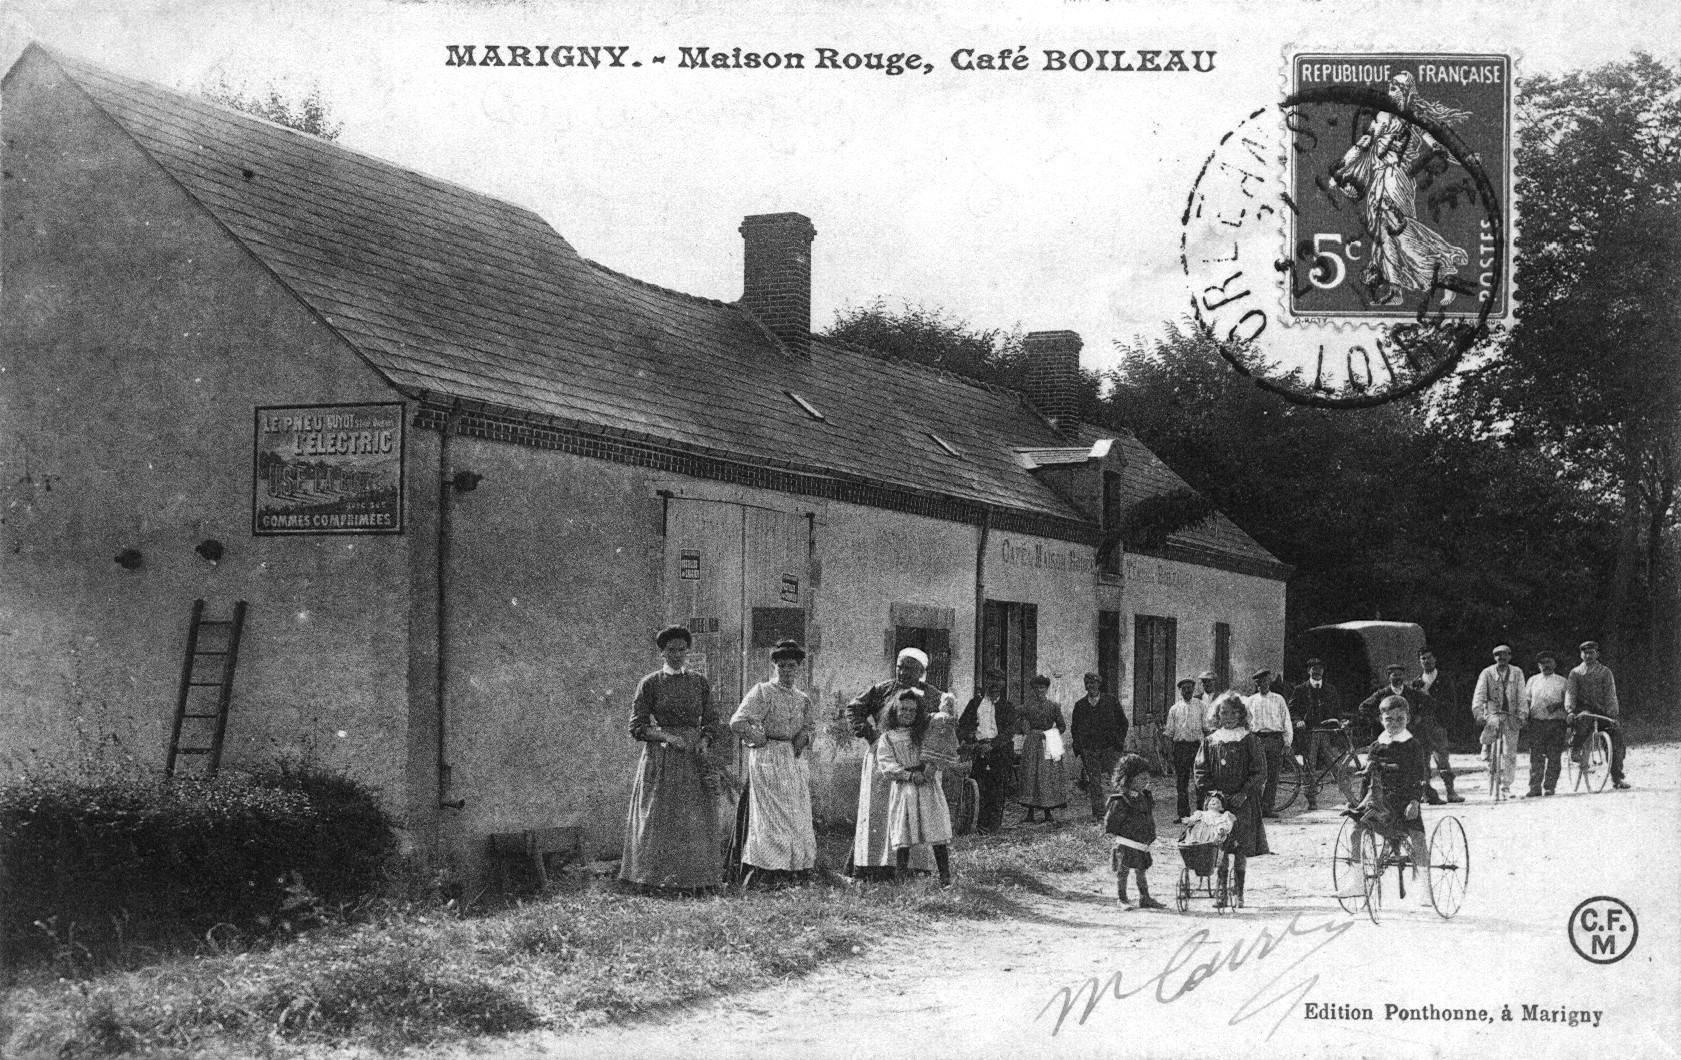 Marigny les Usages Cafe Boileau